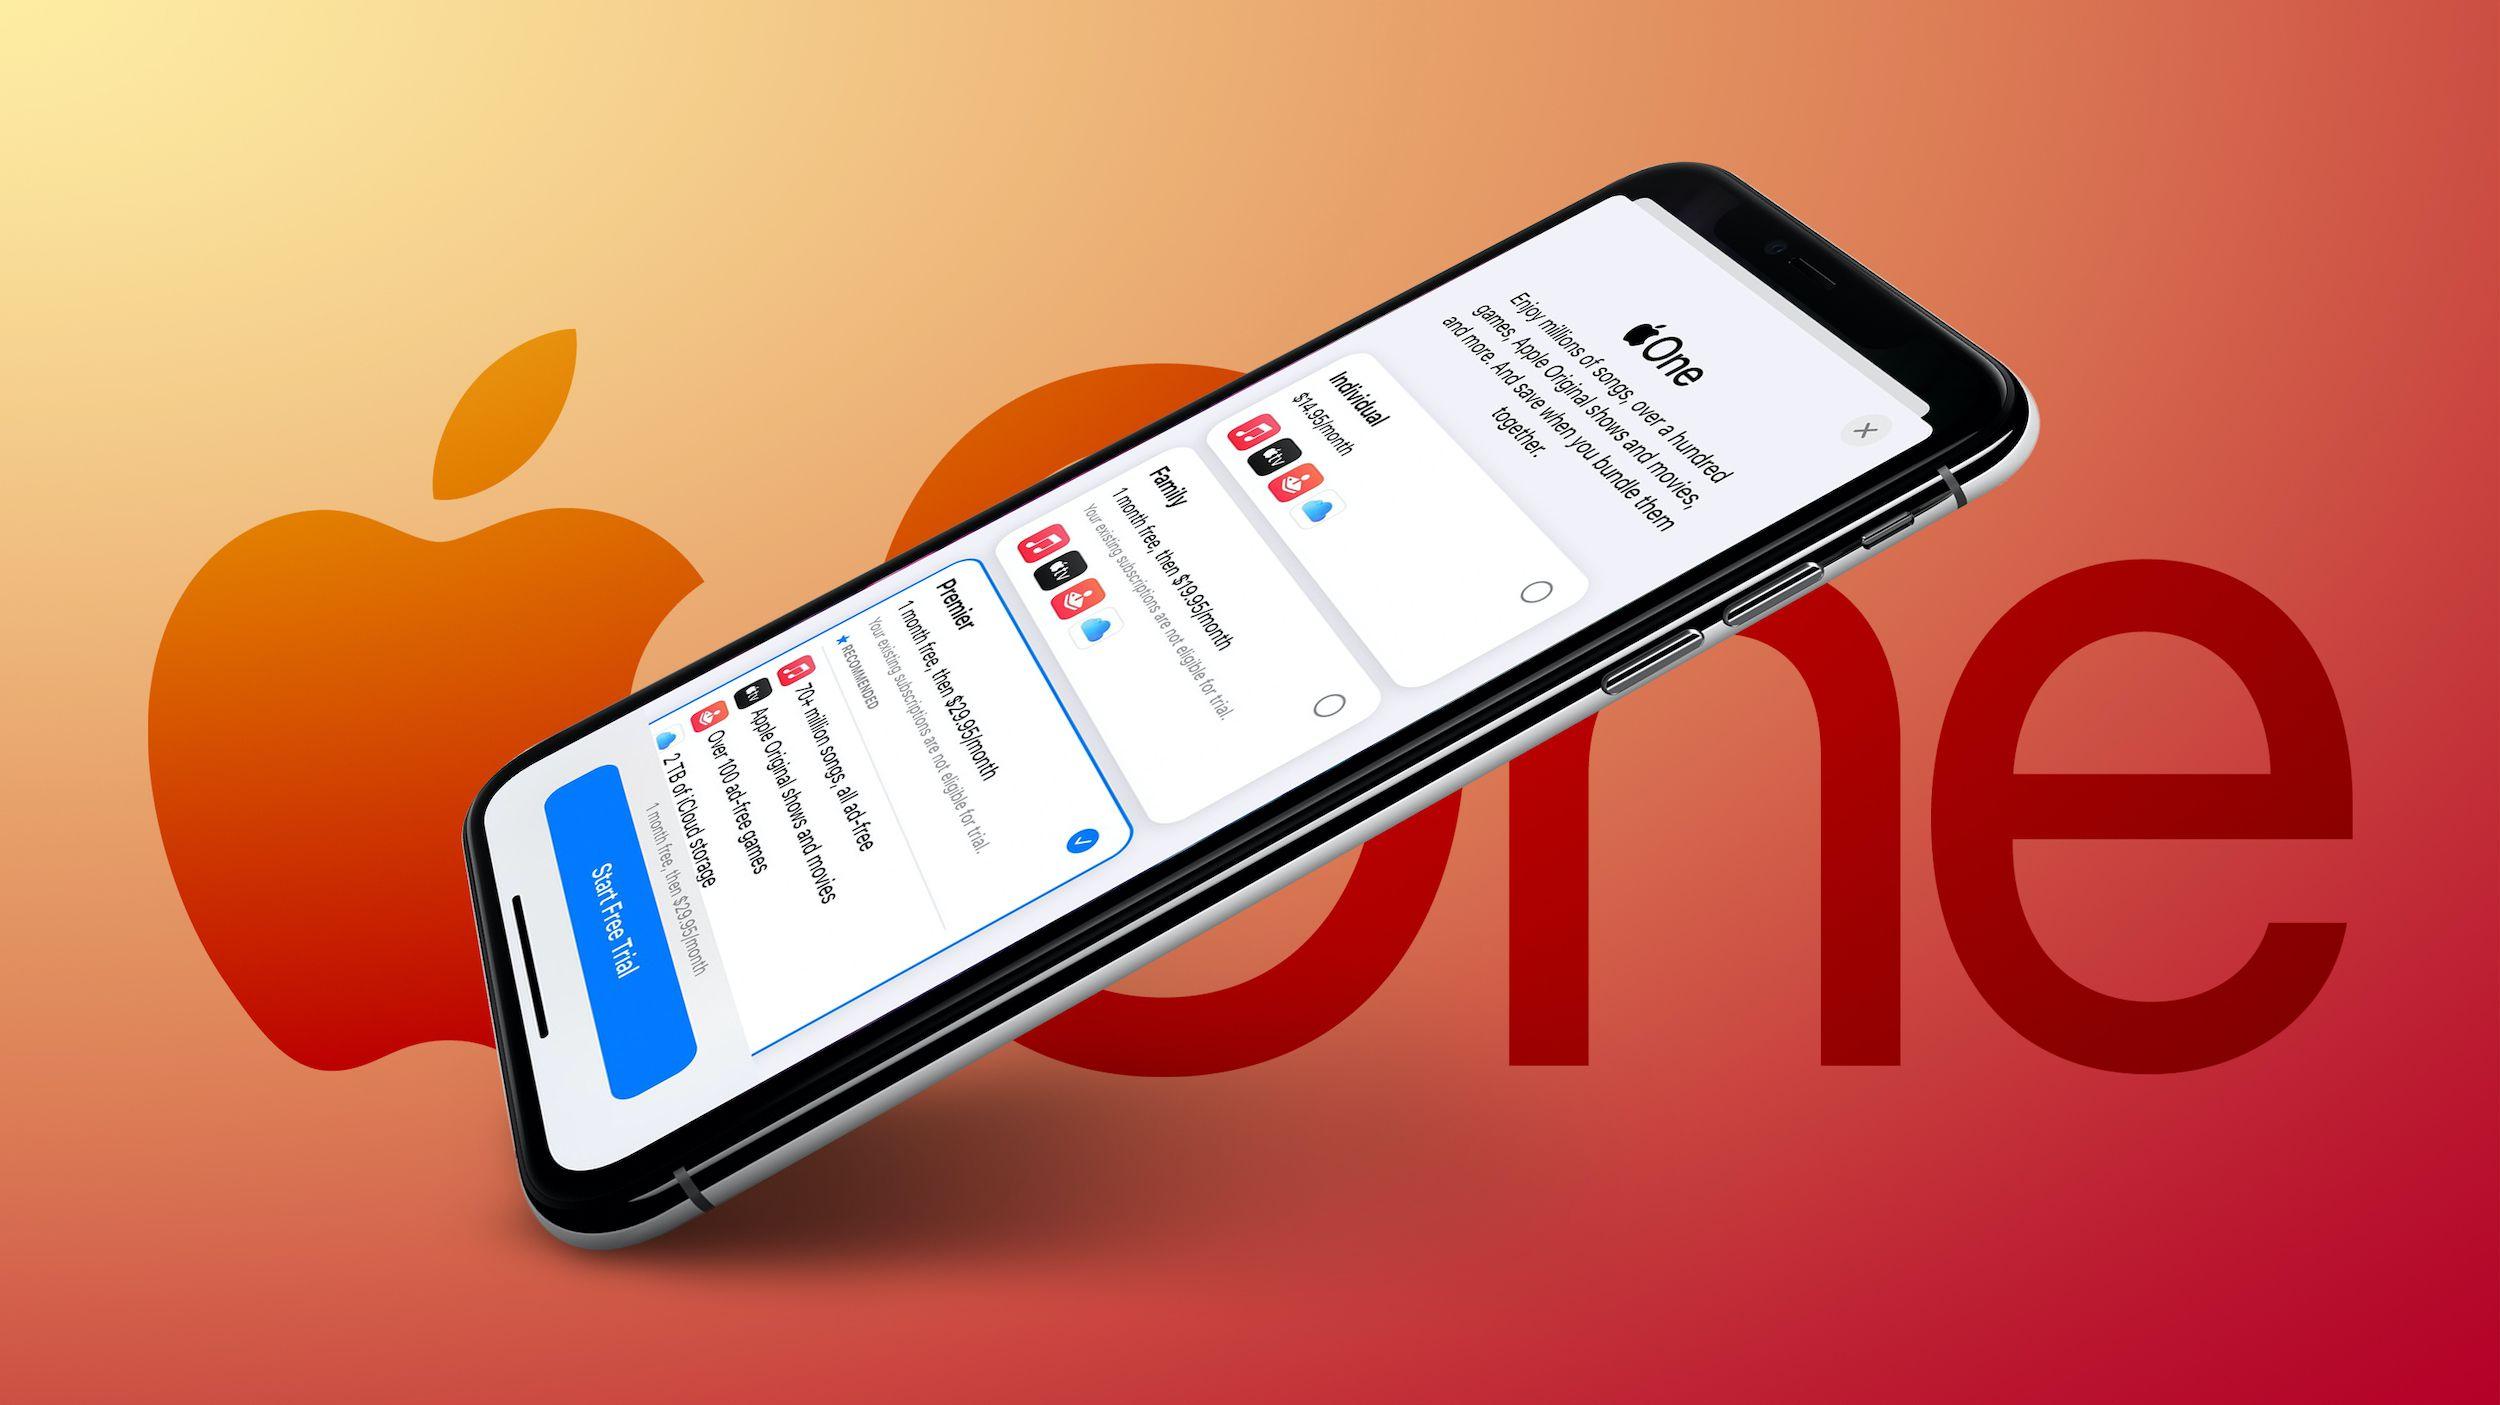 Apple One is Now Available: Save Money by Bundling Apple Music iCloud Storage Apple TV+ Apple Arcade… – MacRumors